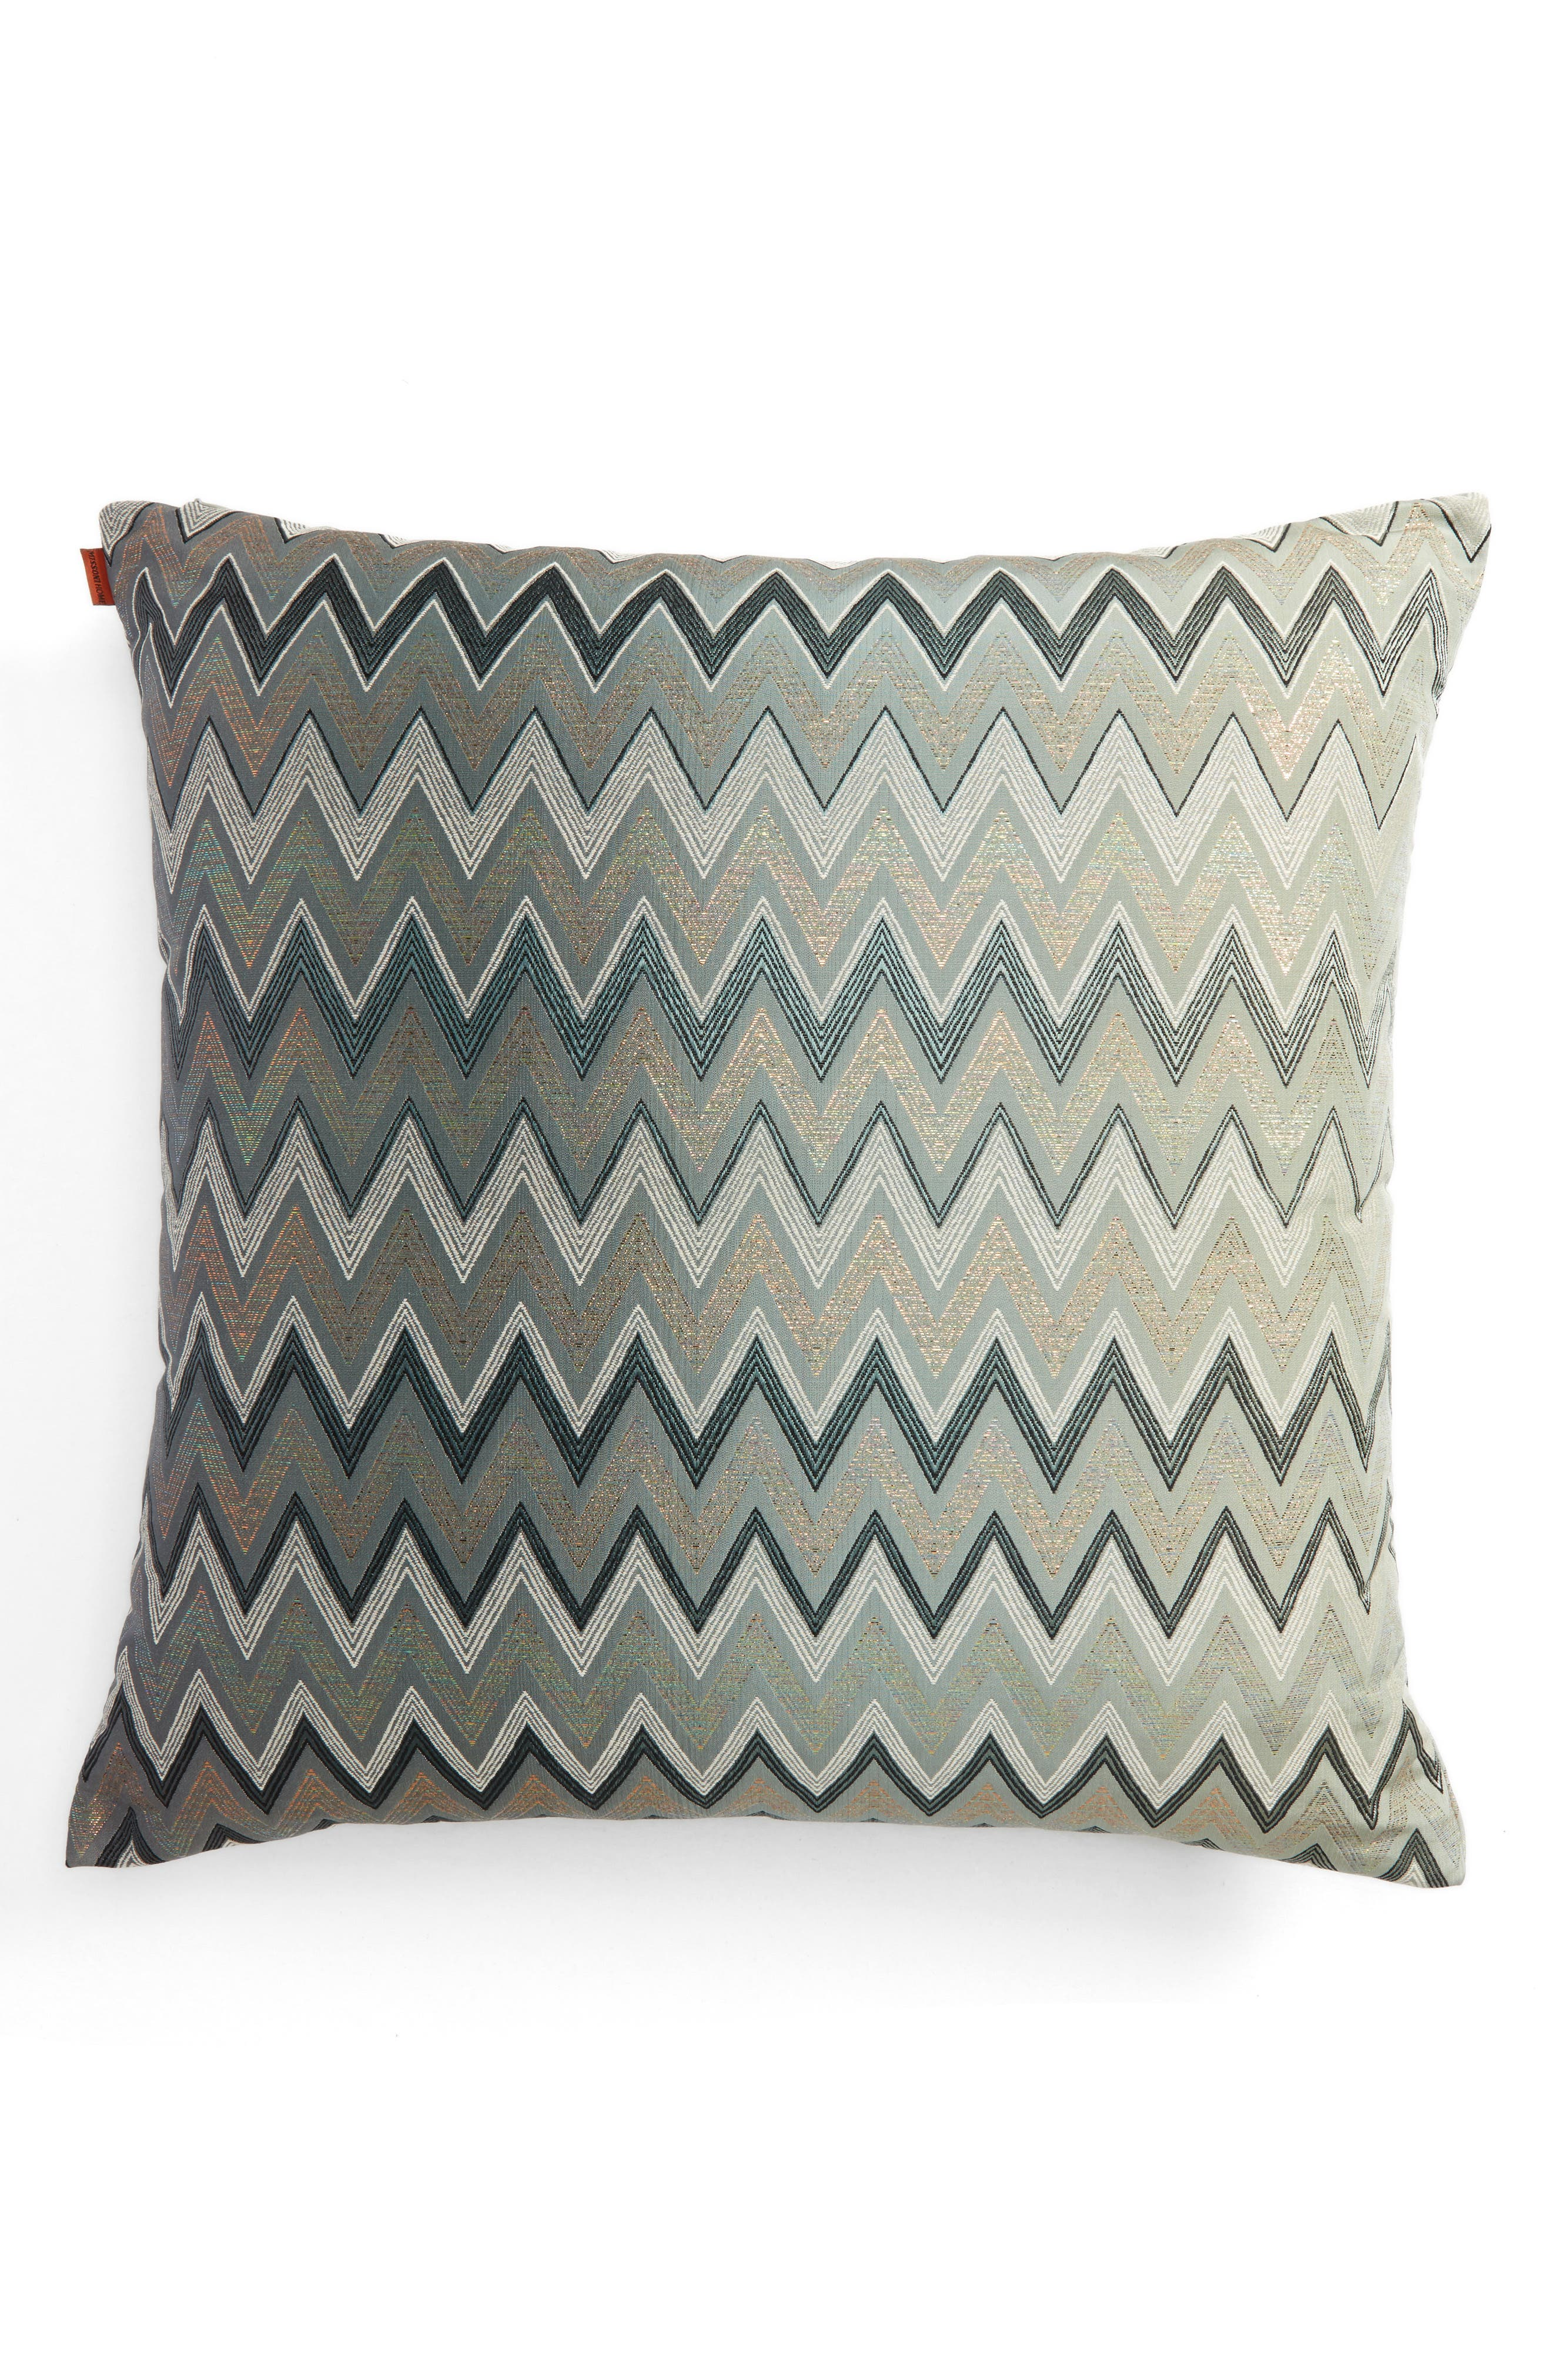 Taipei Accent Pillow,                         Main,                         color, Multi Blue